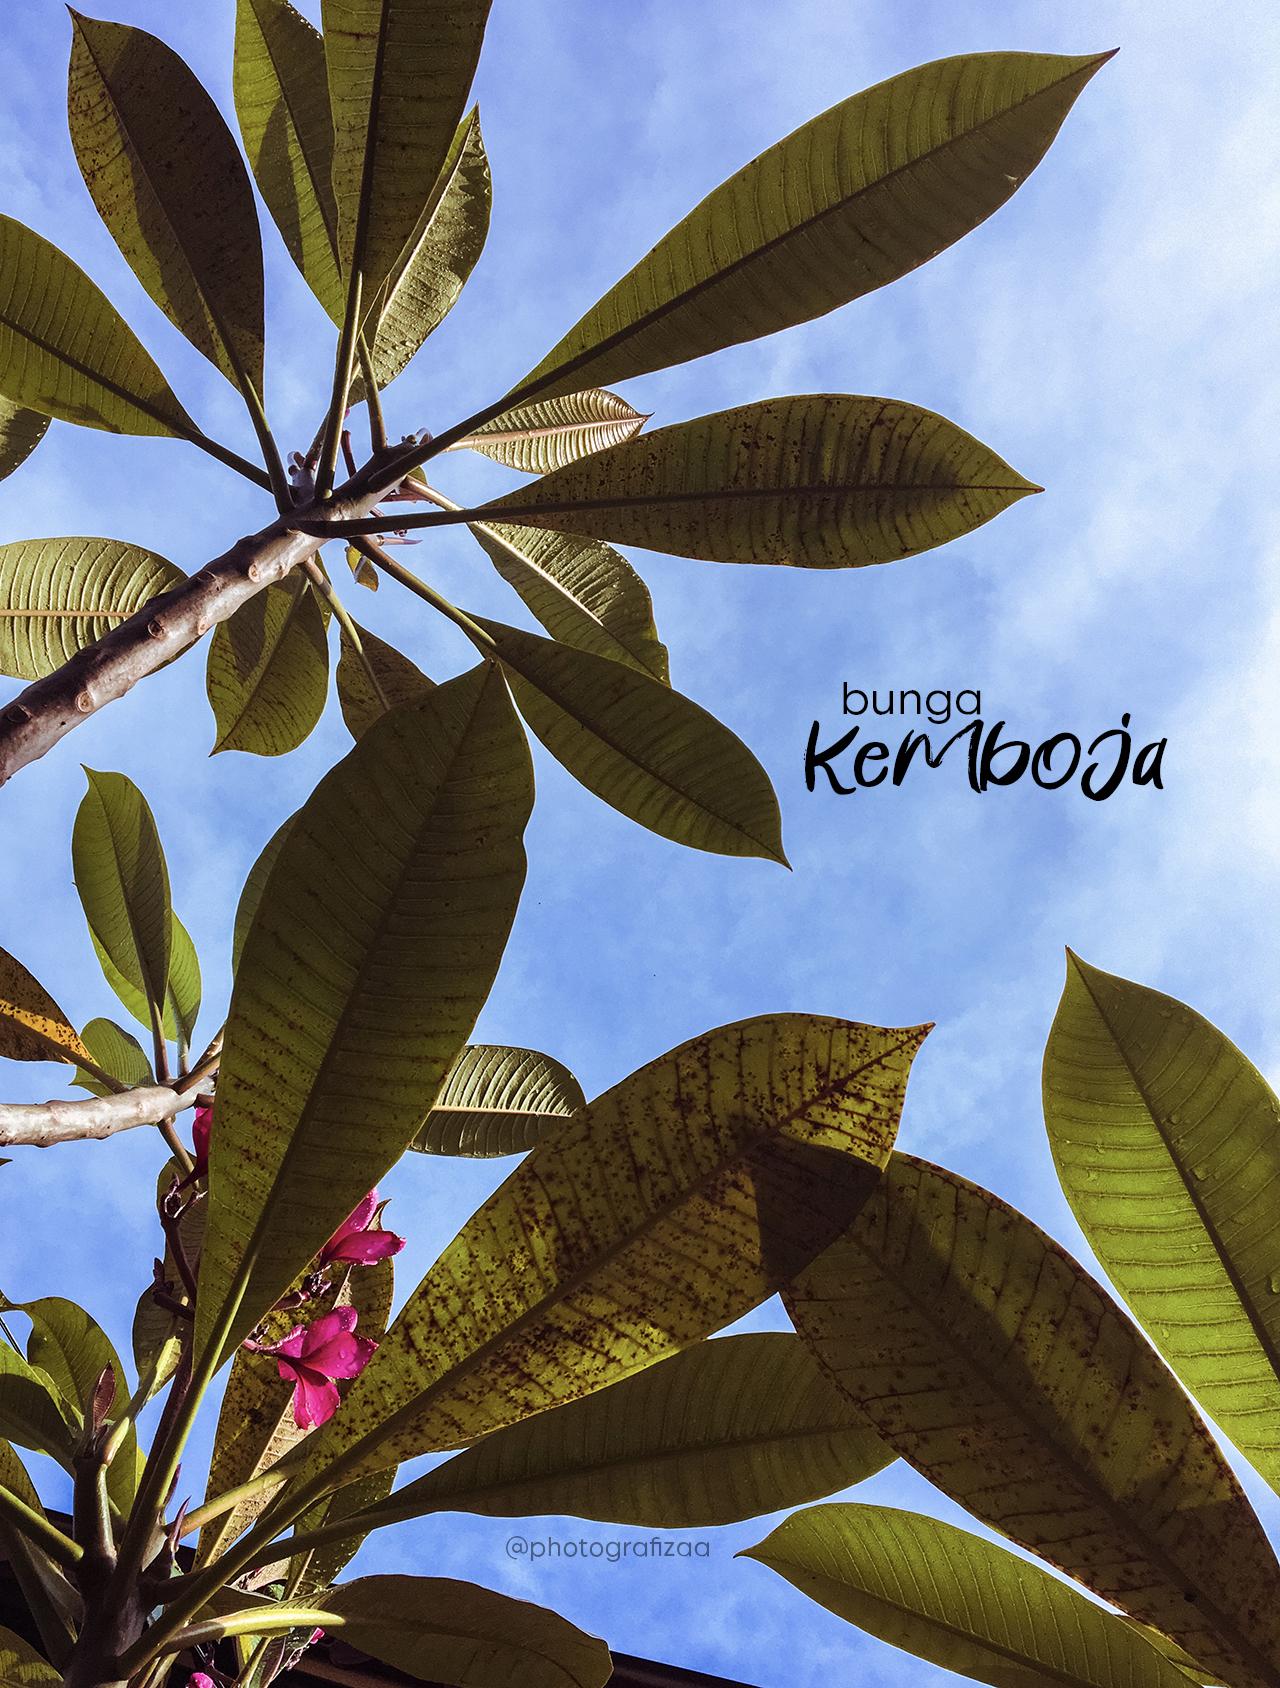 Pokok Bunga Kemboja Merah